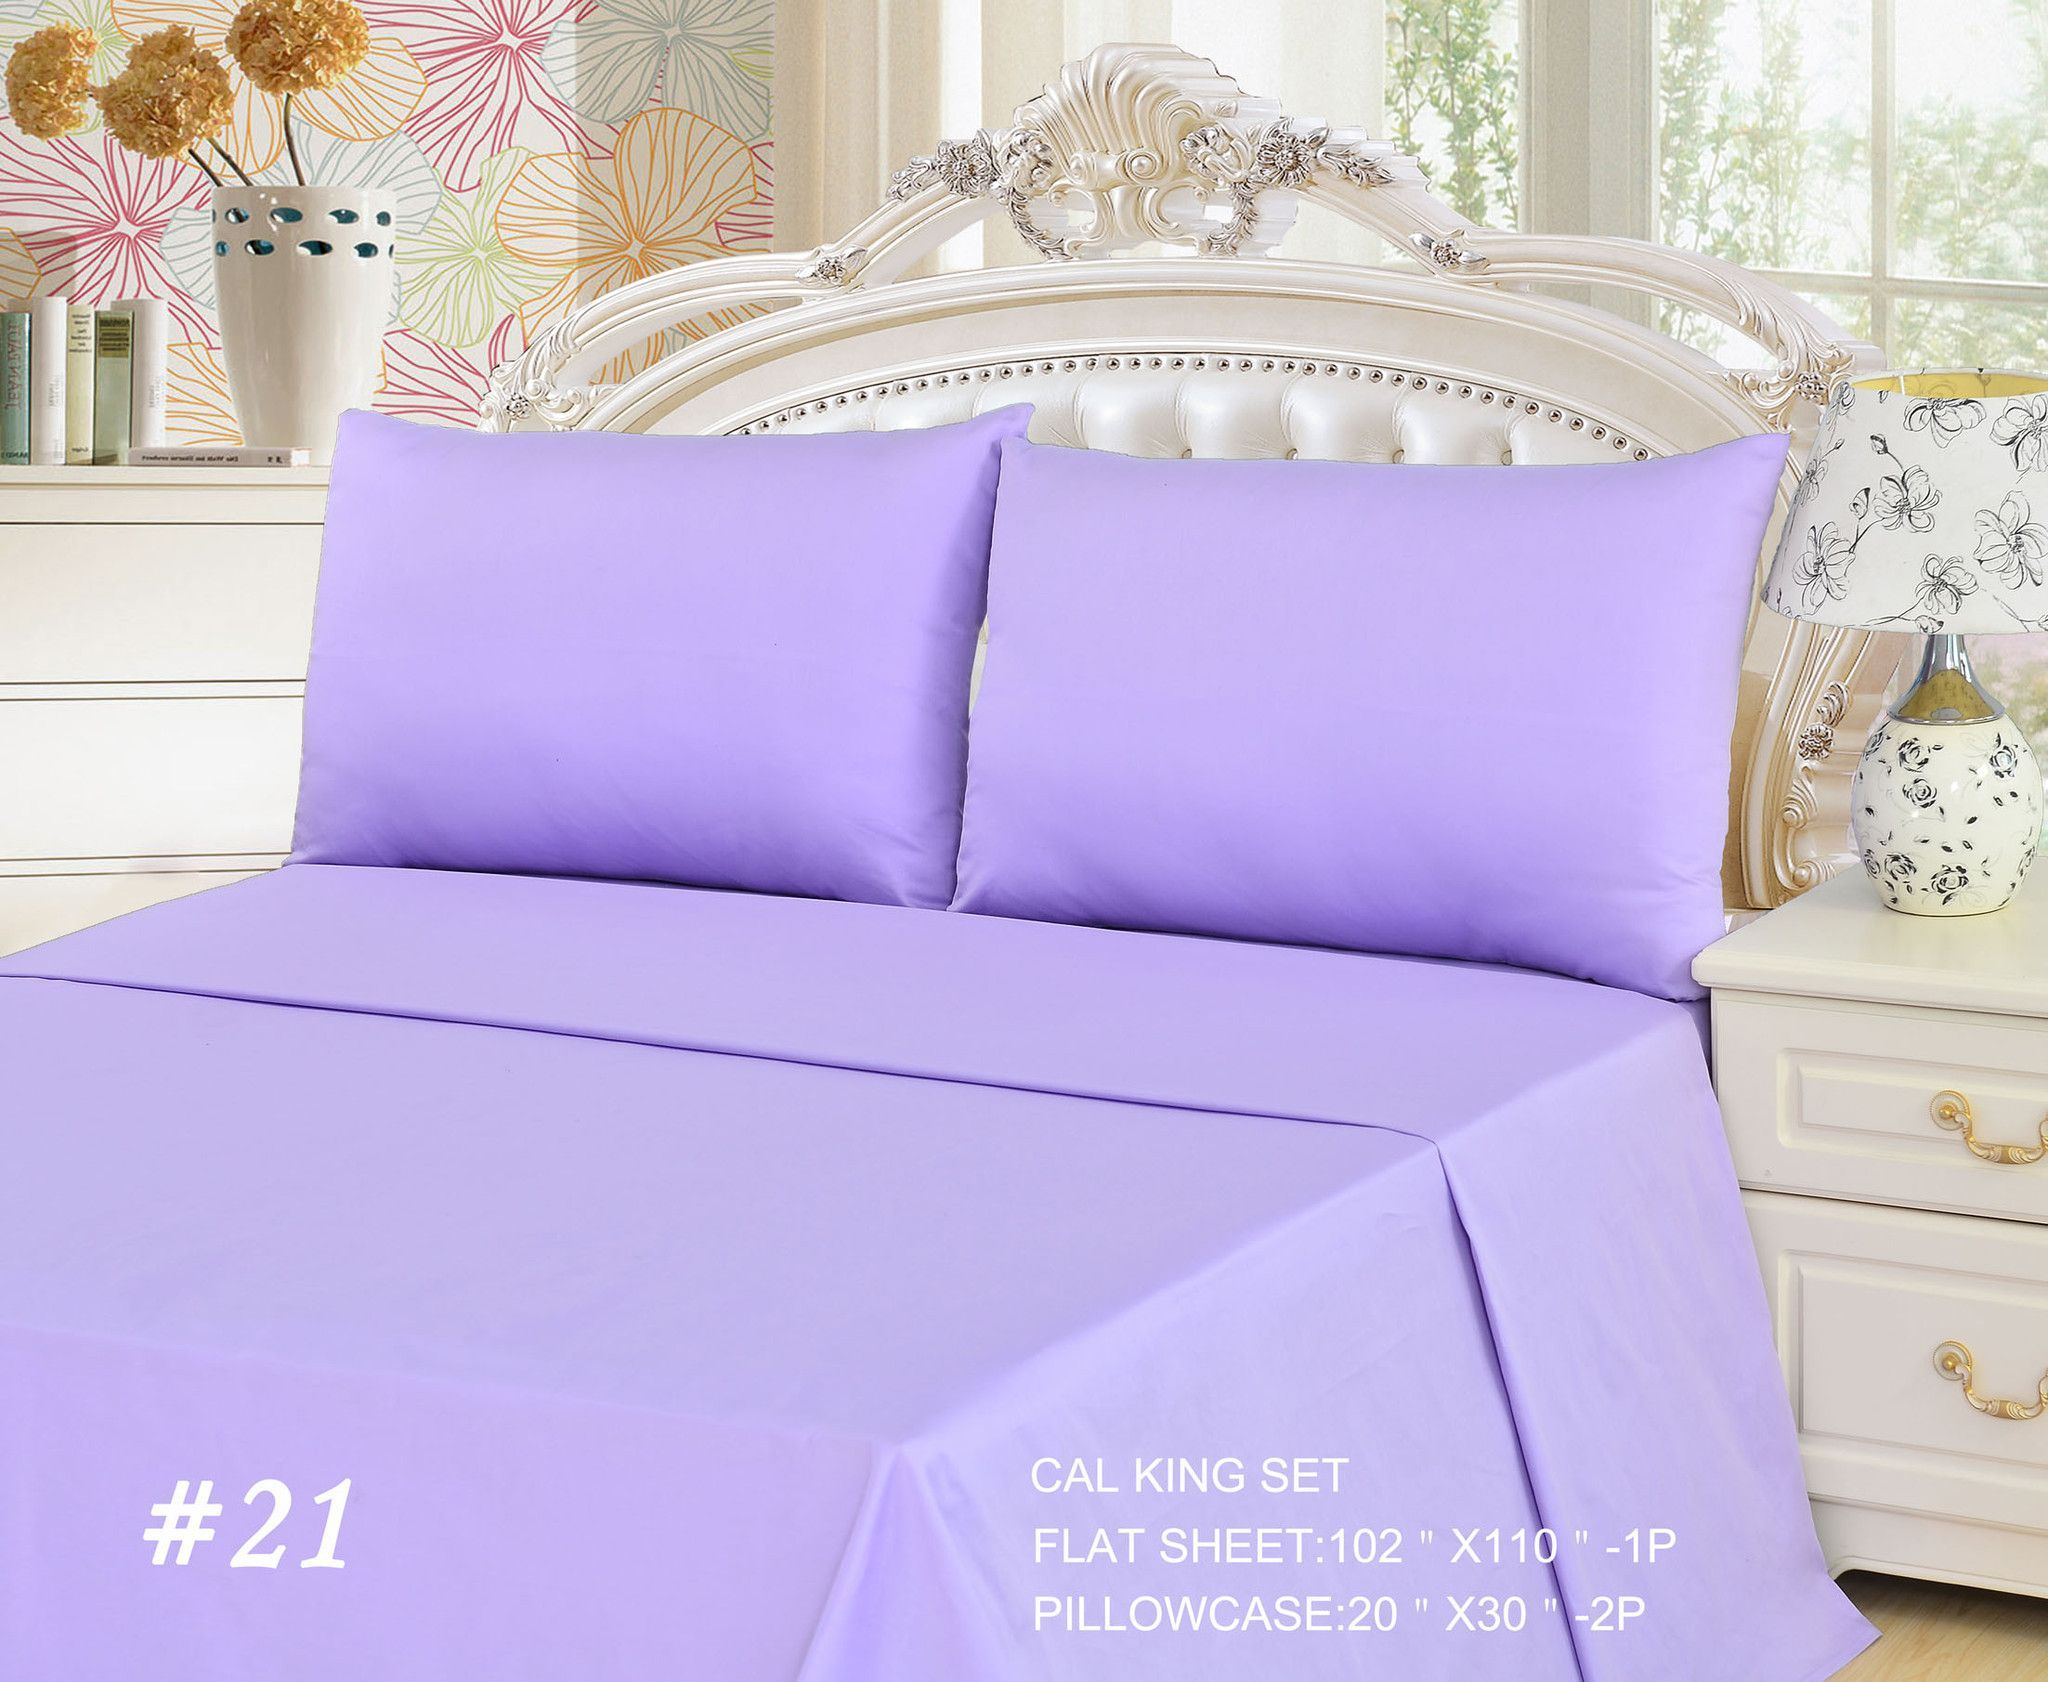 Light purple bed sets - Tache 2 To 3 Pc Cotton Solid Lavender Dreams Light Purple Bed Sheet Set Flat Sheet